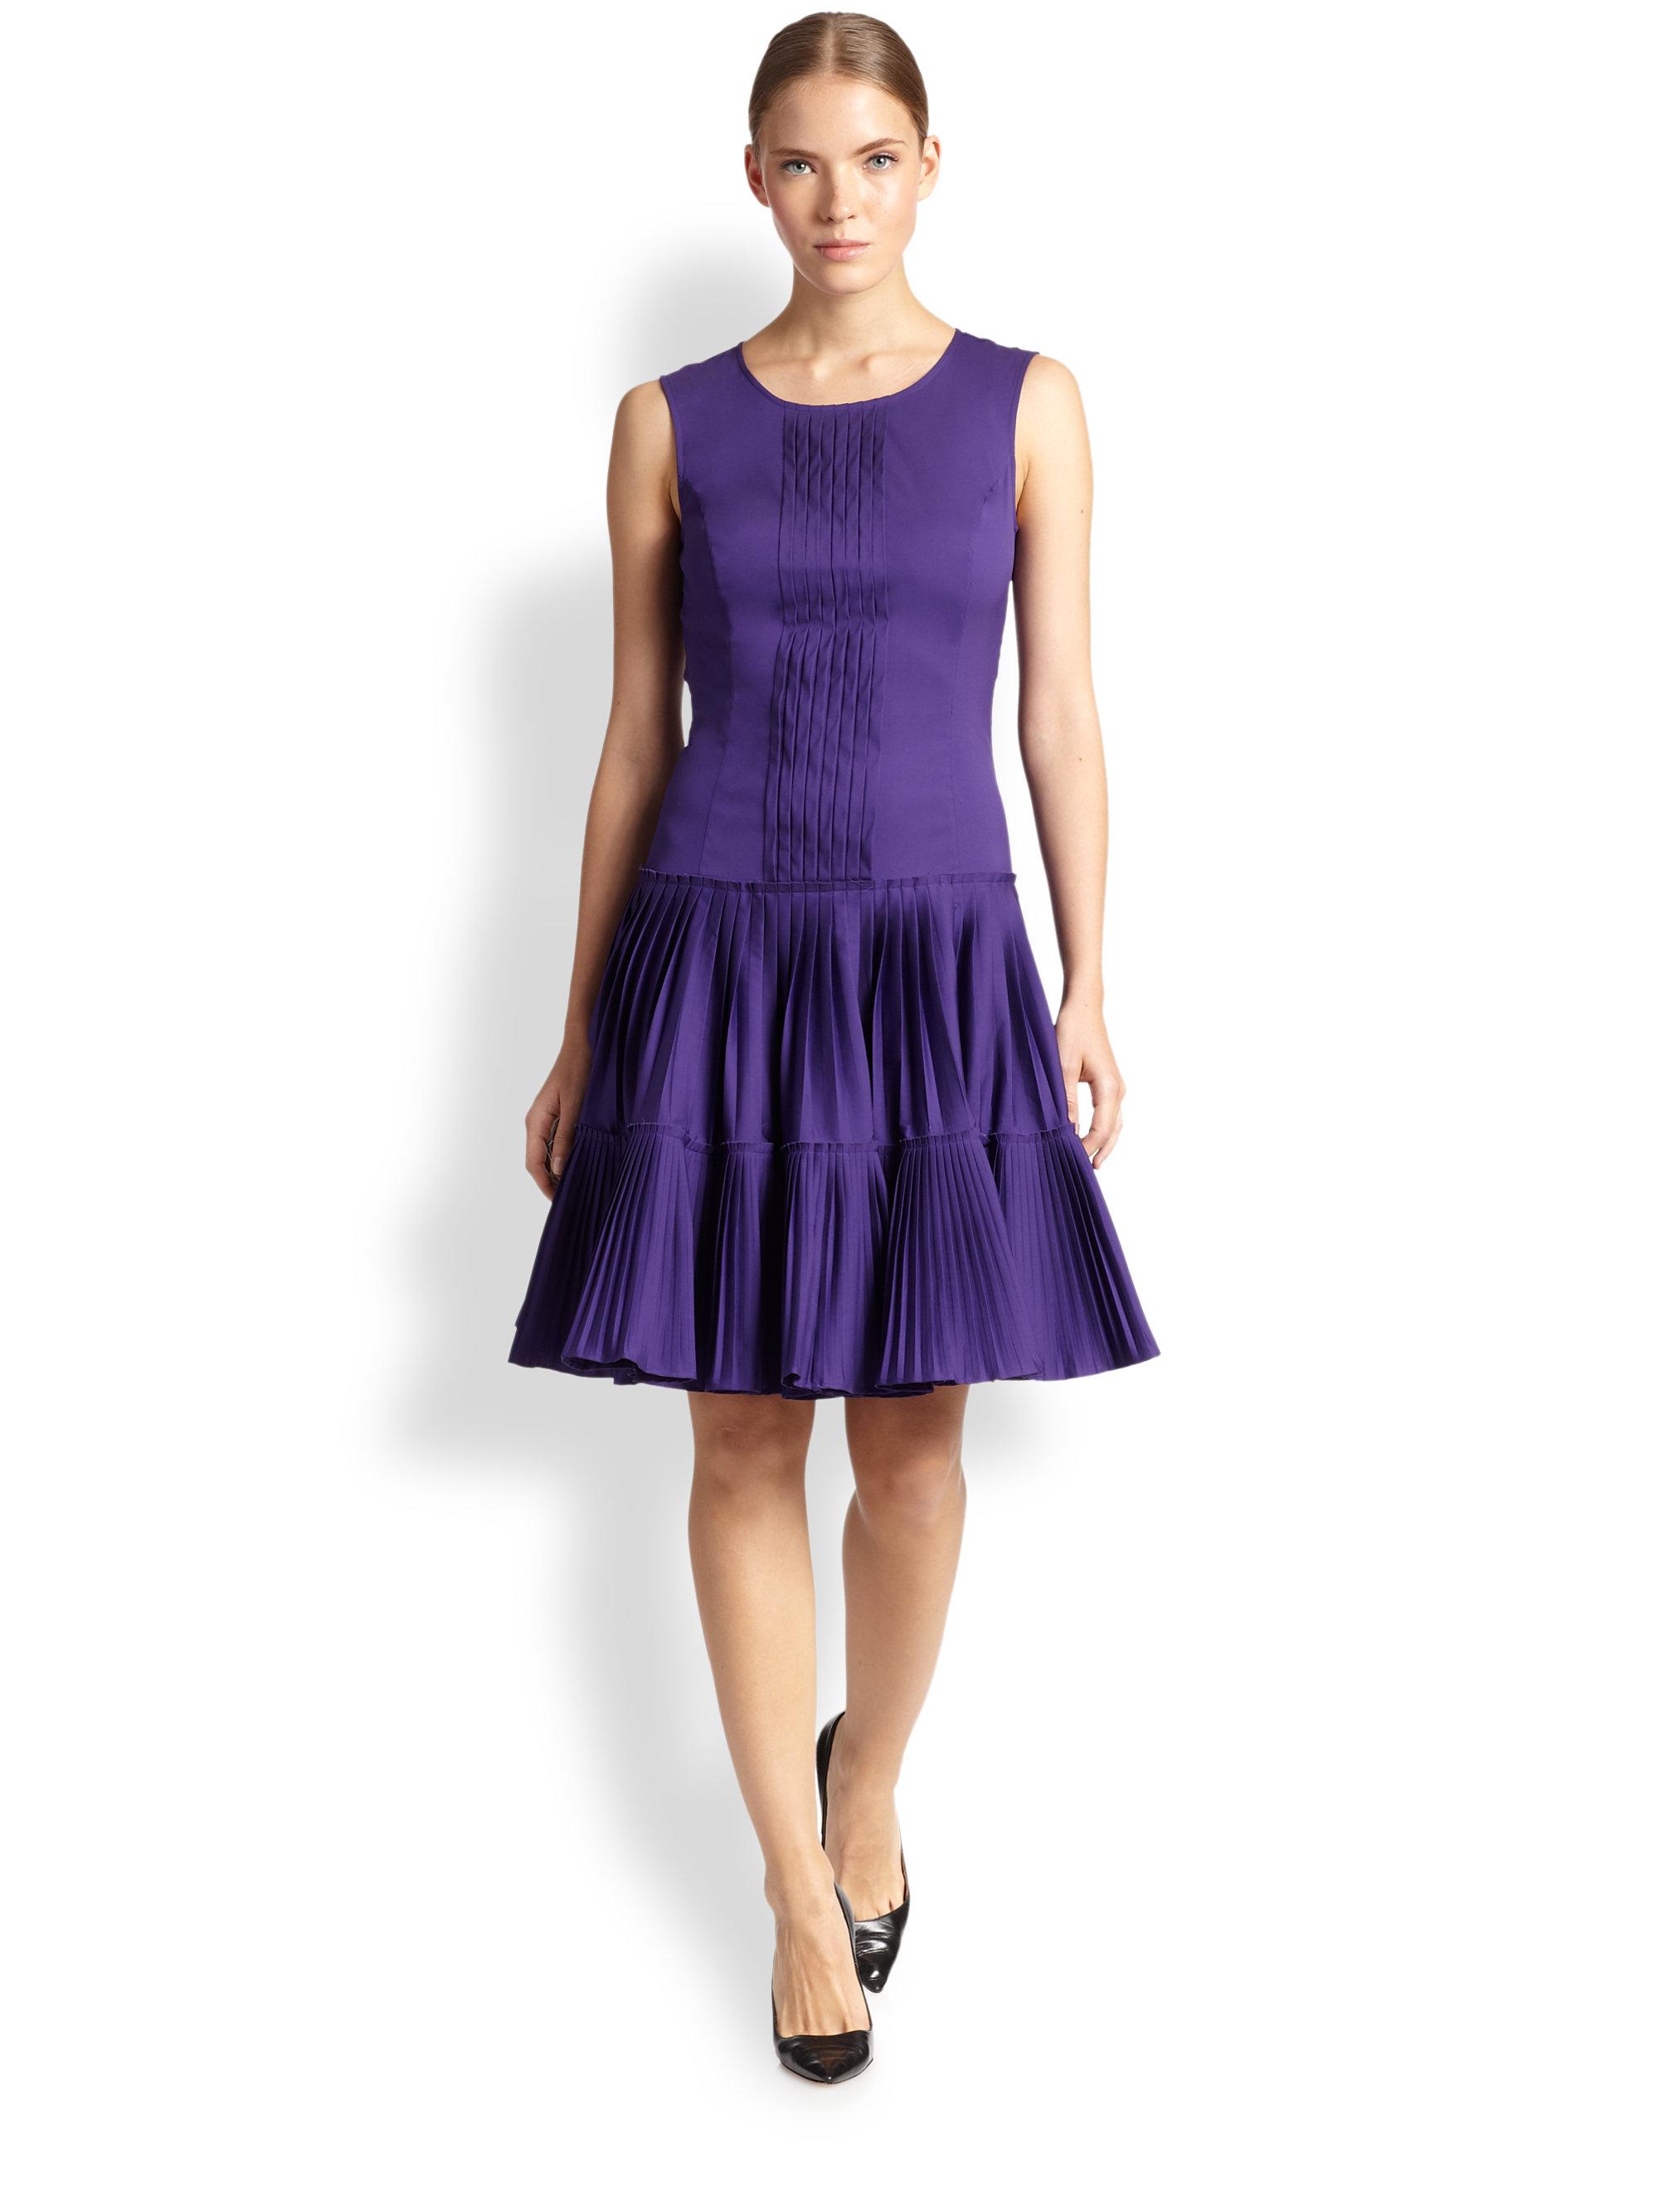 Hermosa Oscar De La Renta Cocktail Dresses Ideas Ornamento ...